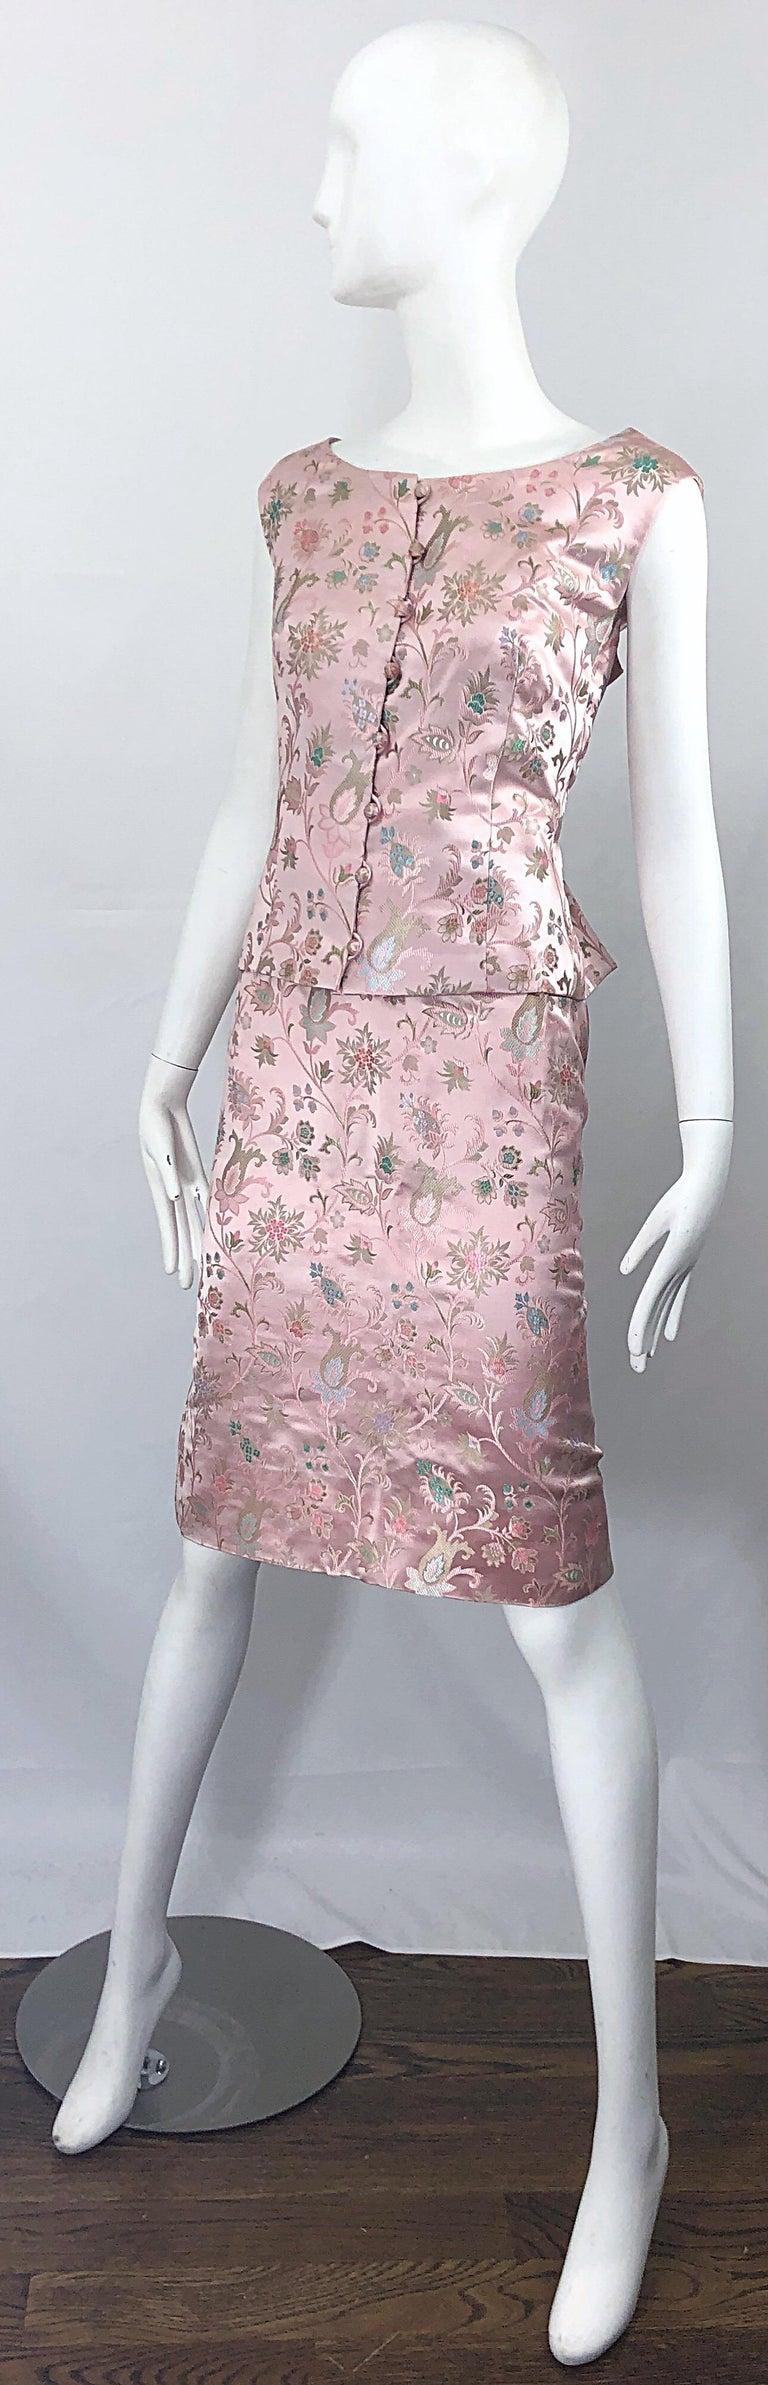 Dynasty 1960s For Lord & Taylor Light Pink Large Size 3 Piece Vintage Dress Set For Sale 10